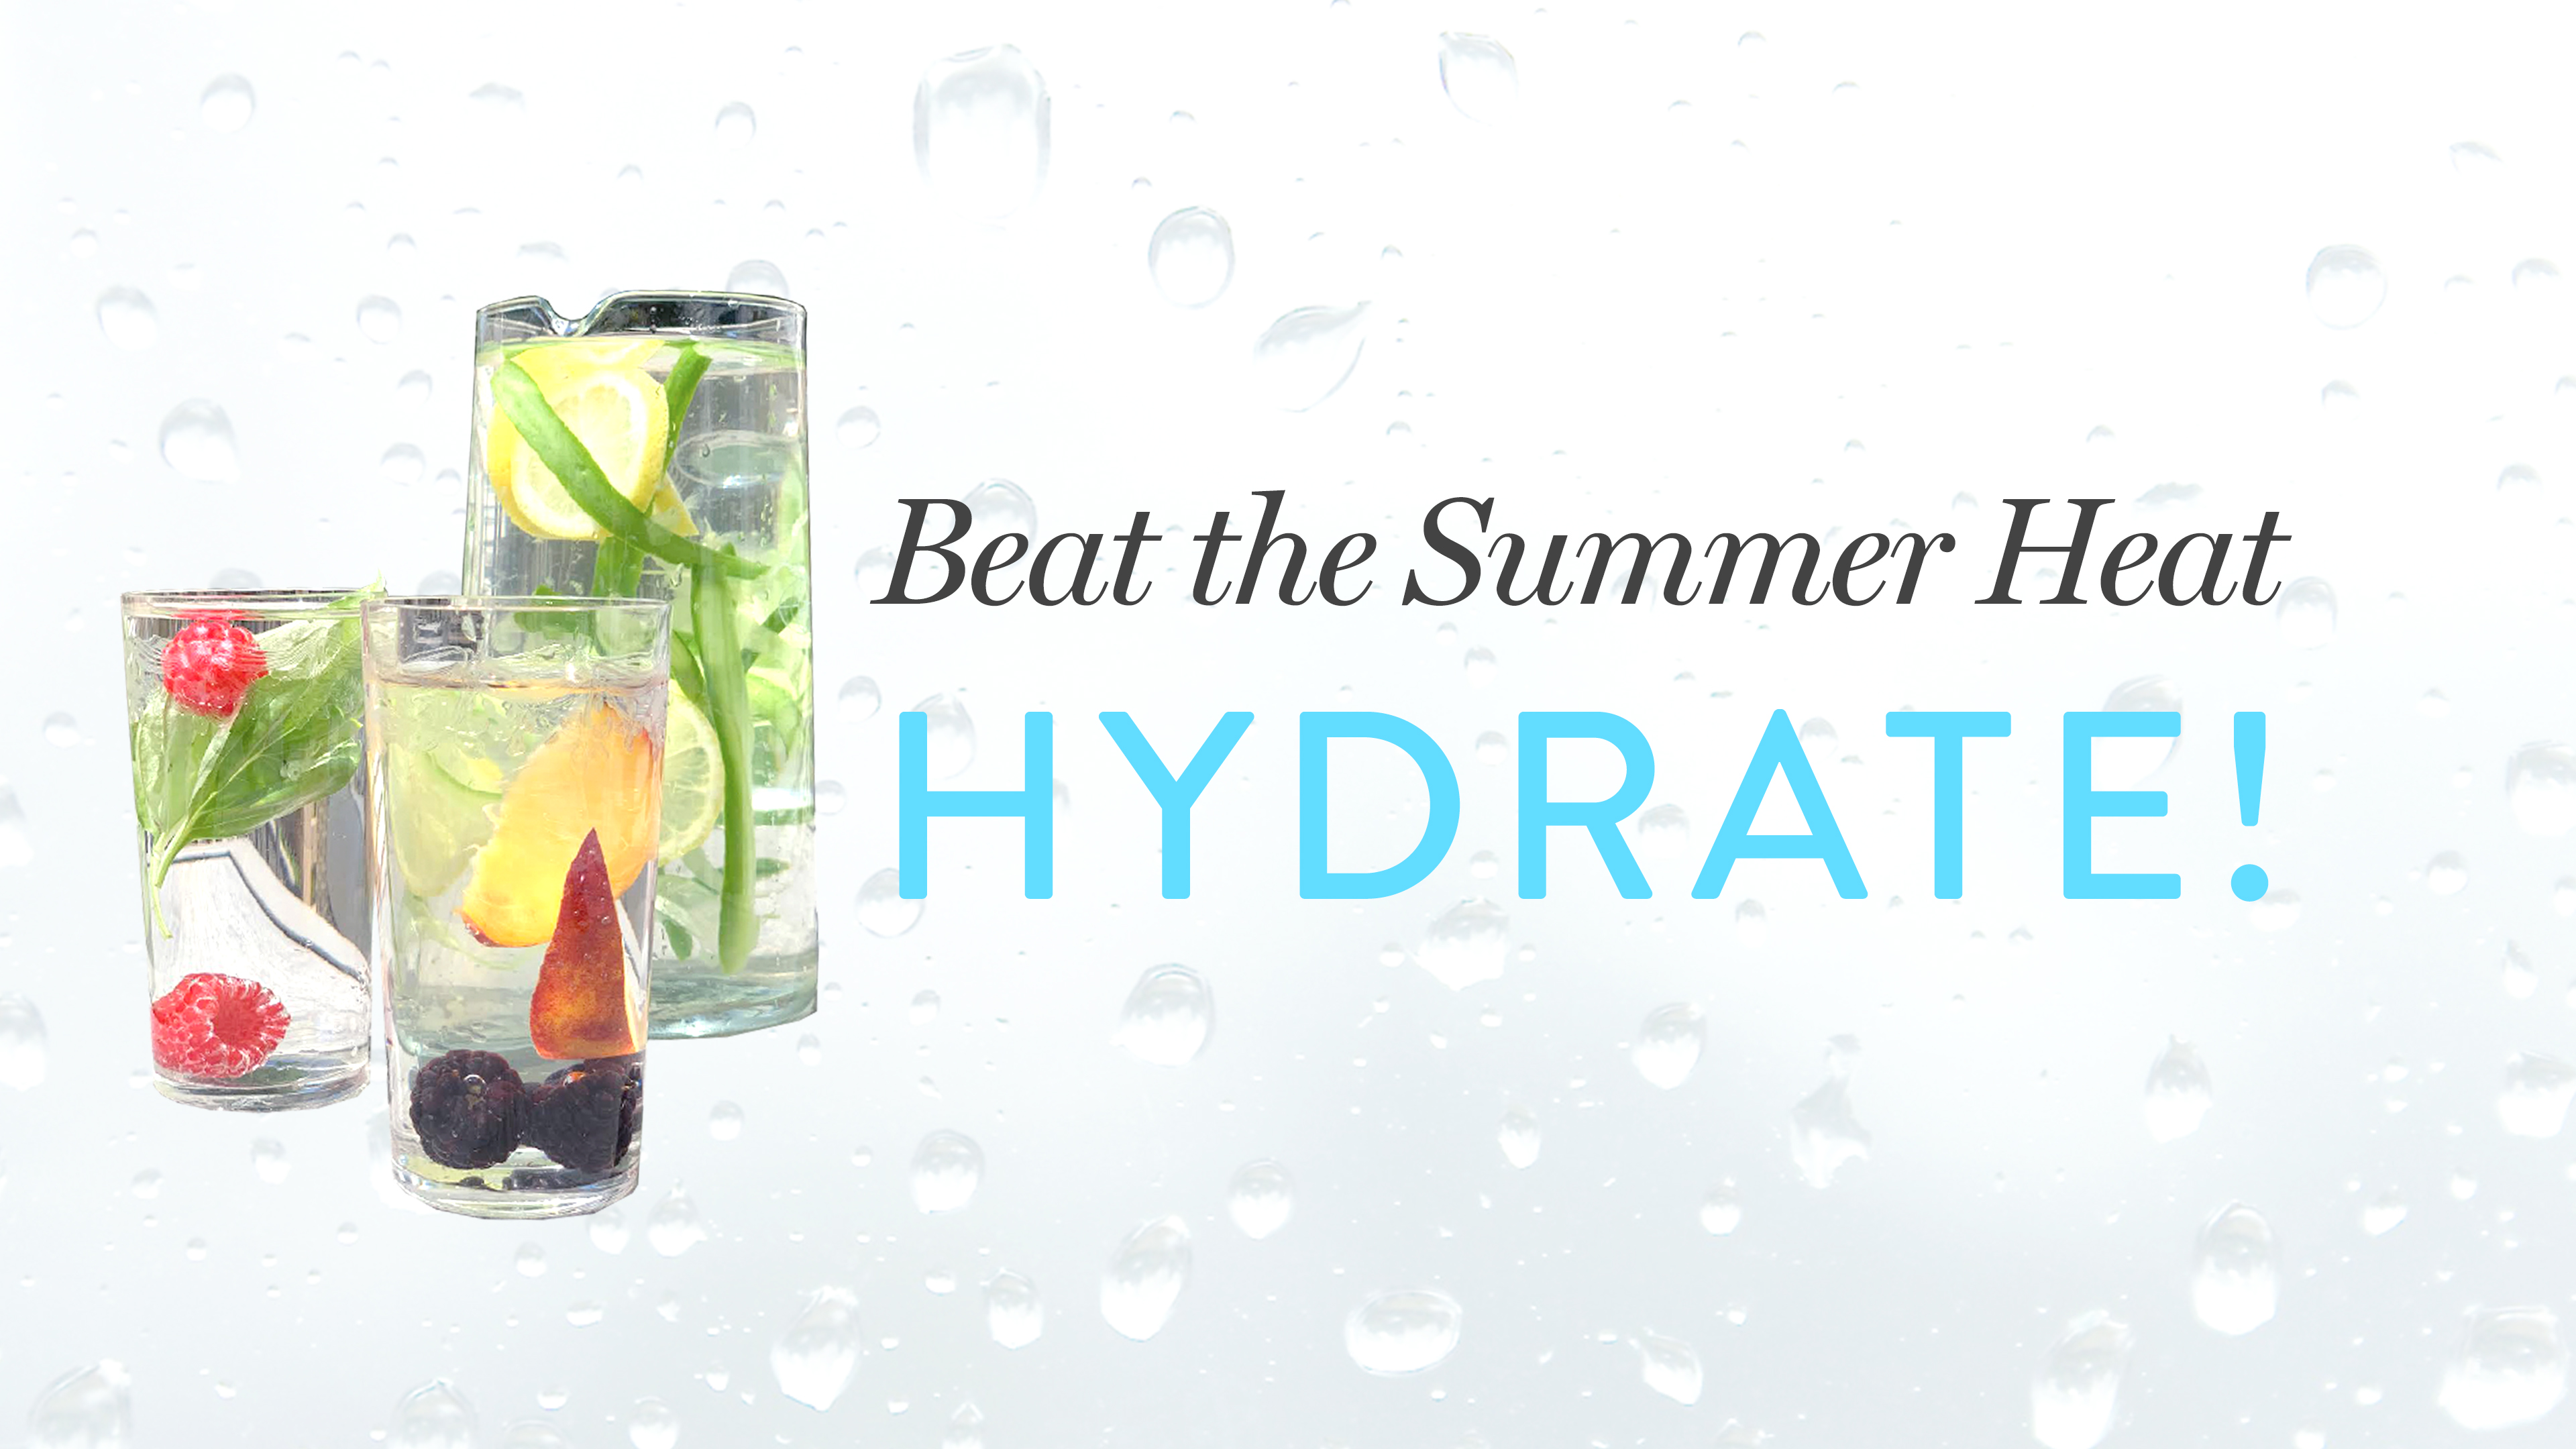 Beat the Summer Heat! HYDRATE!